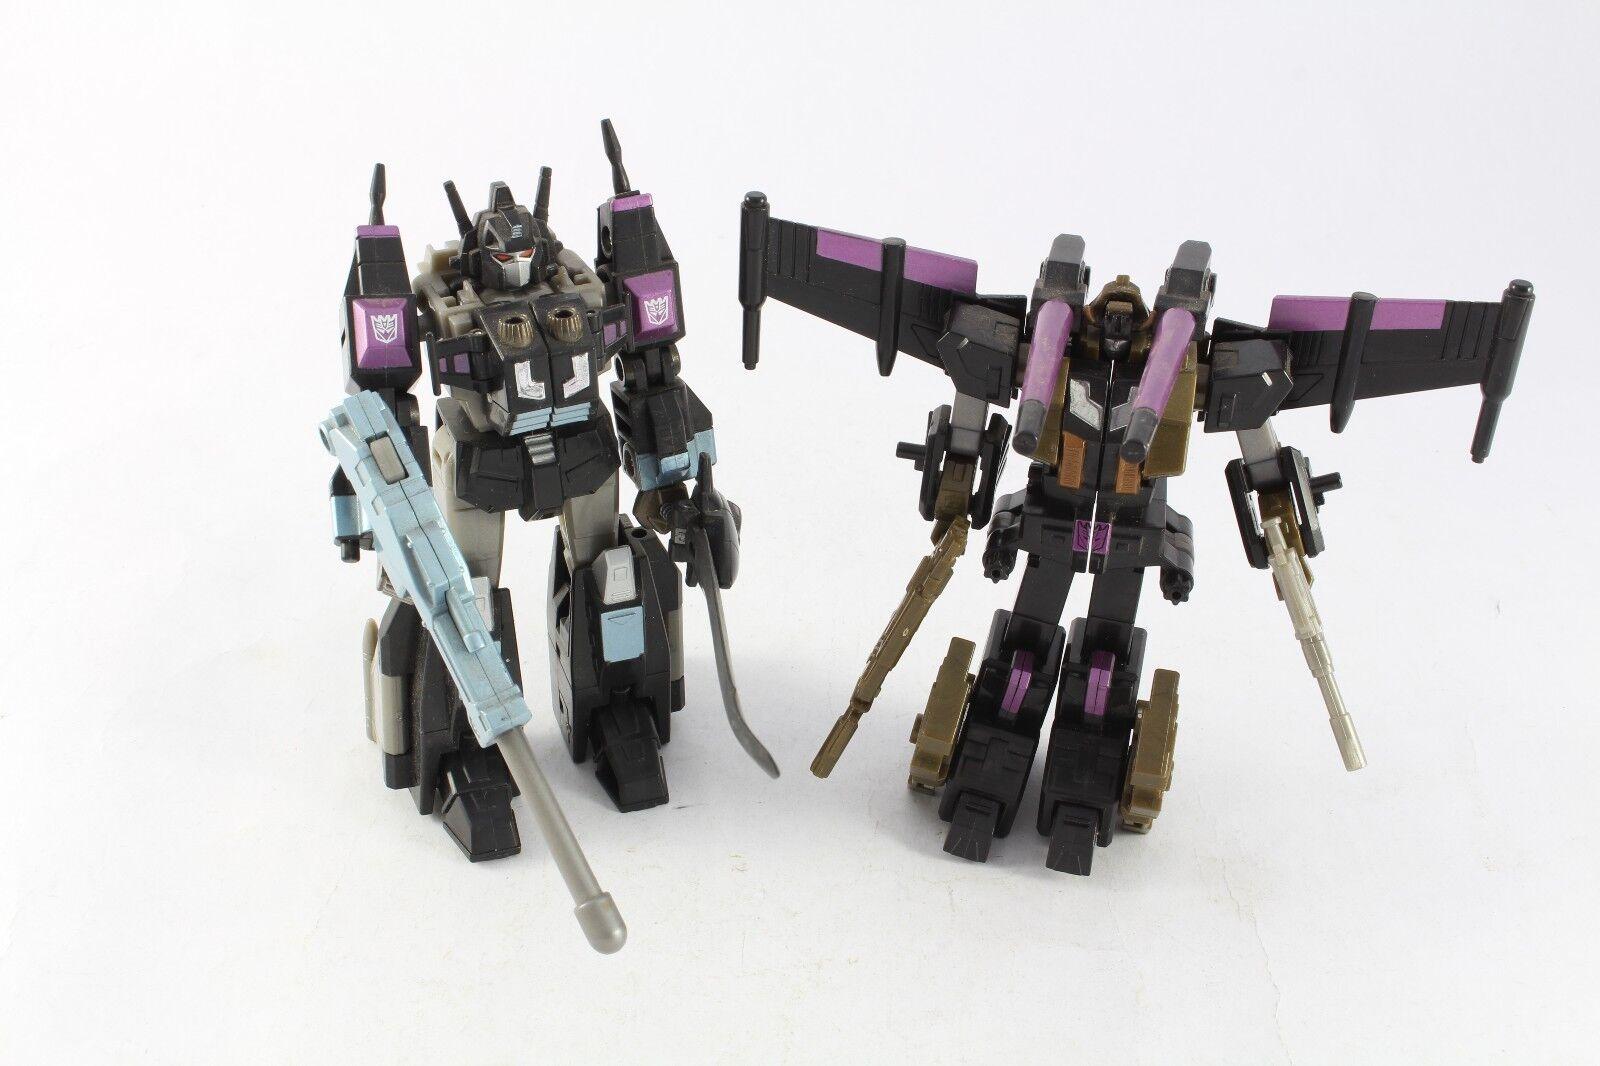 Transformatoren roboter meister rm-17 takara japan ohne sieg leo stern...